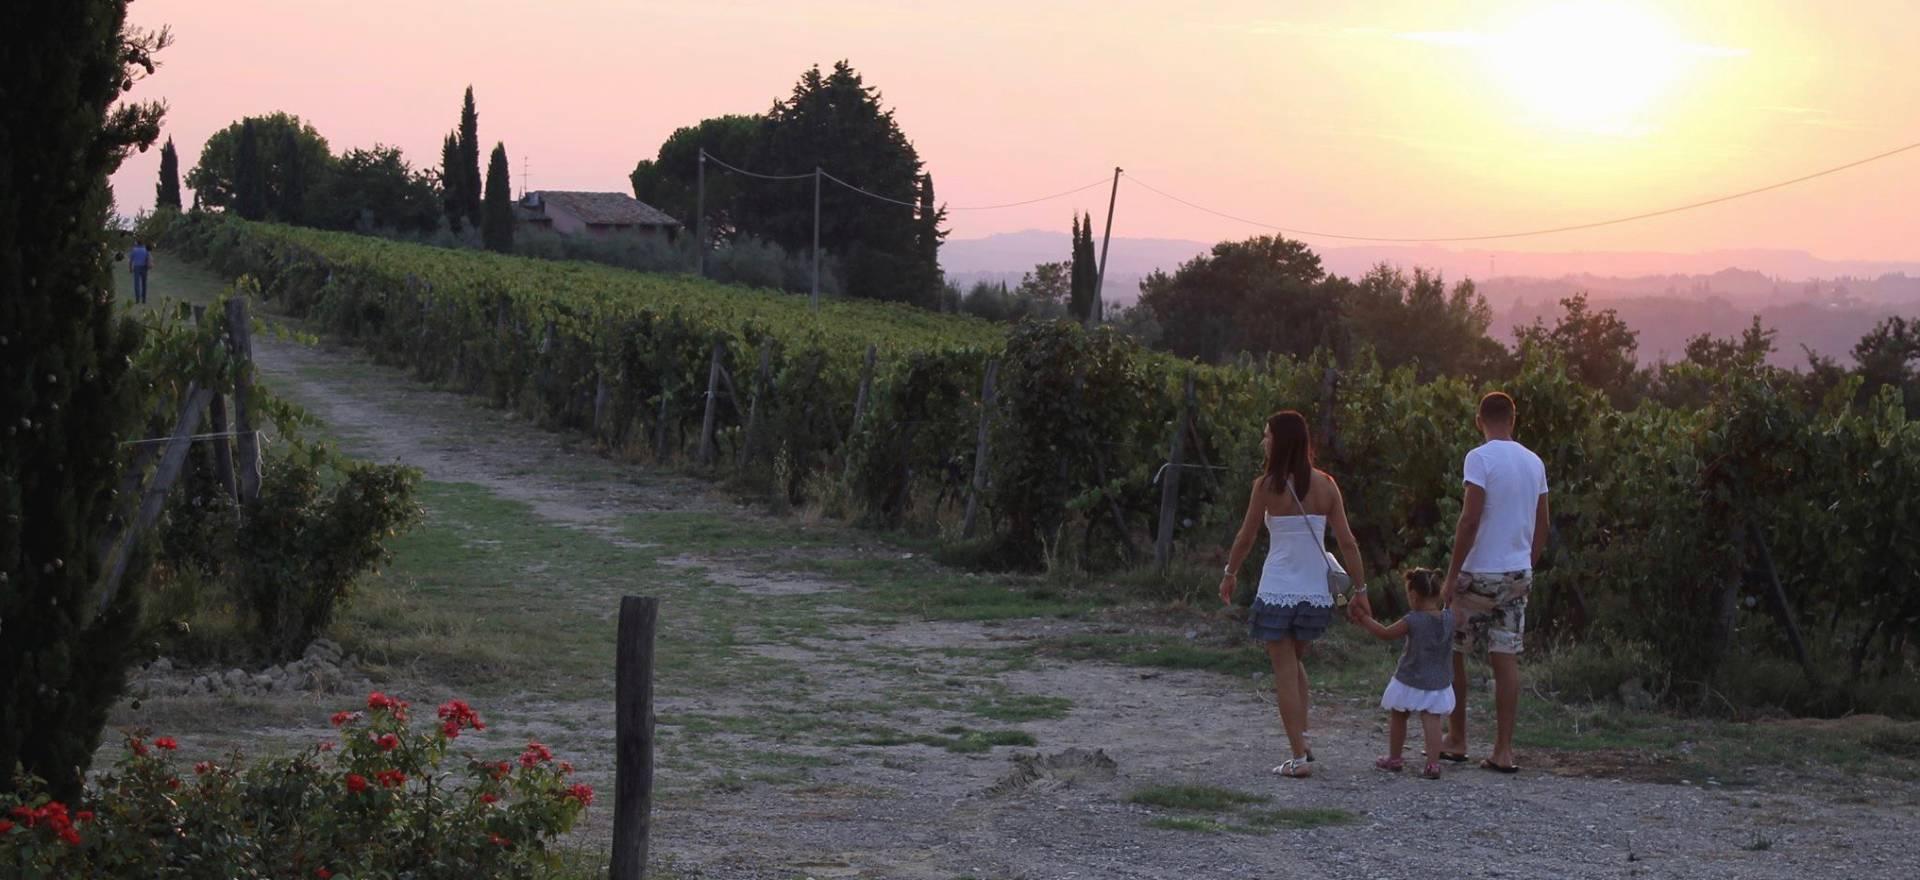 Agriturismo Toscana Agriturismo su una collina nel Chianti